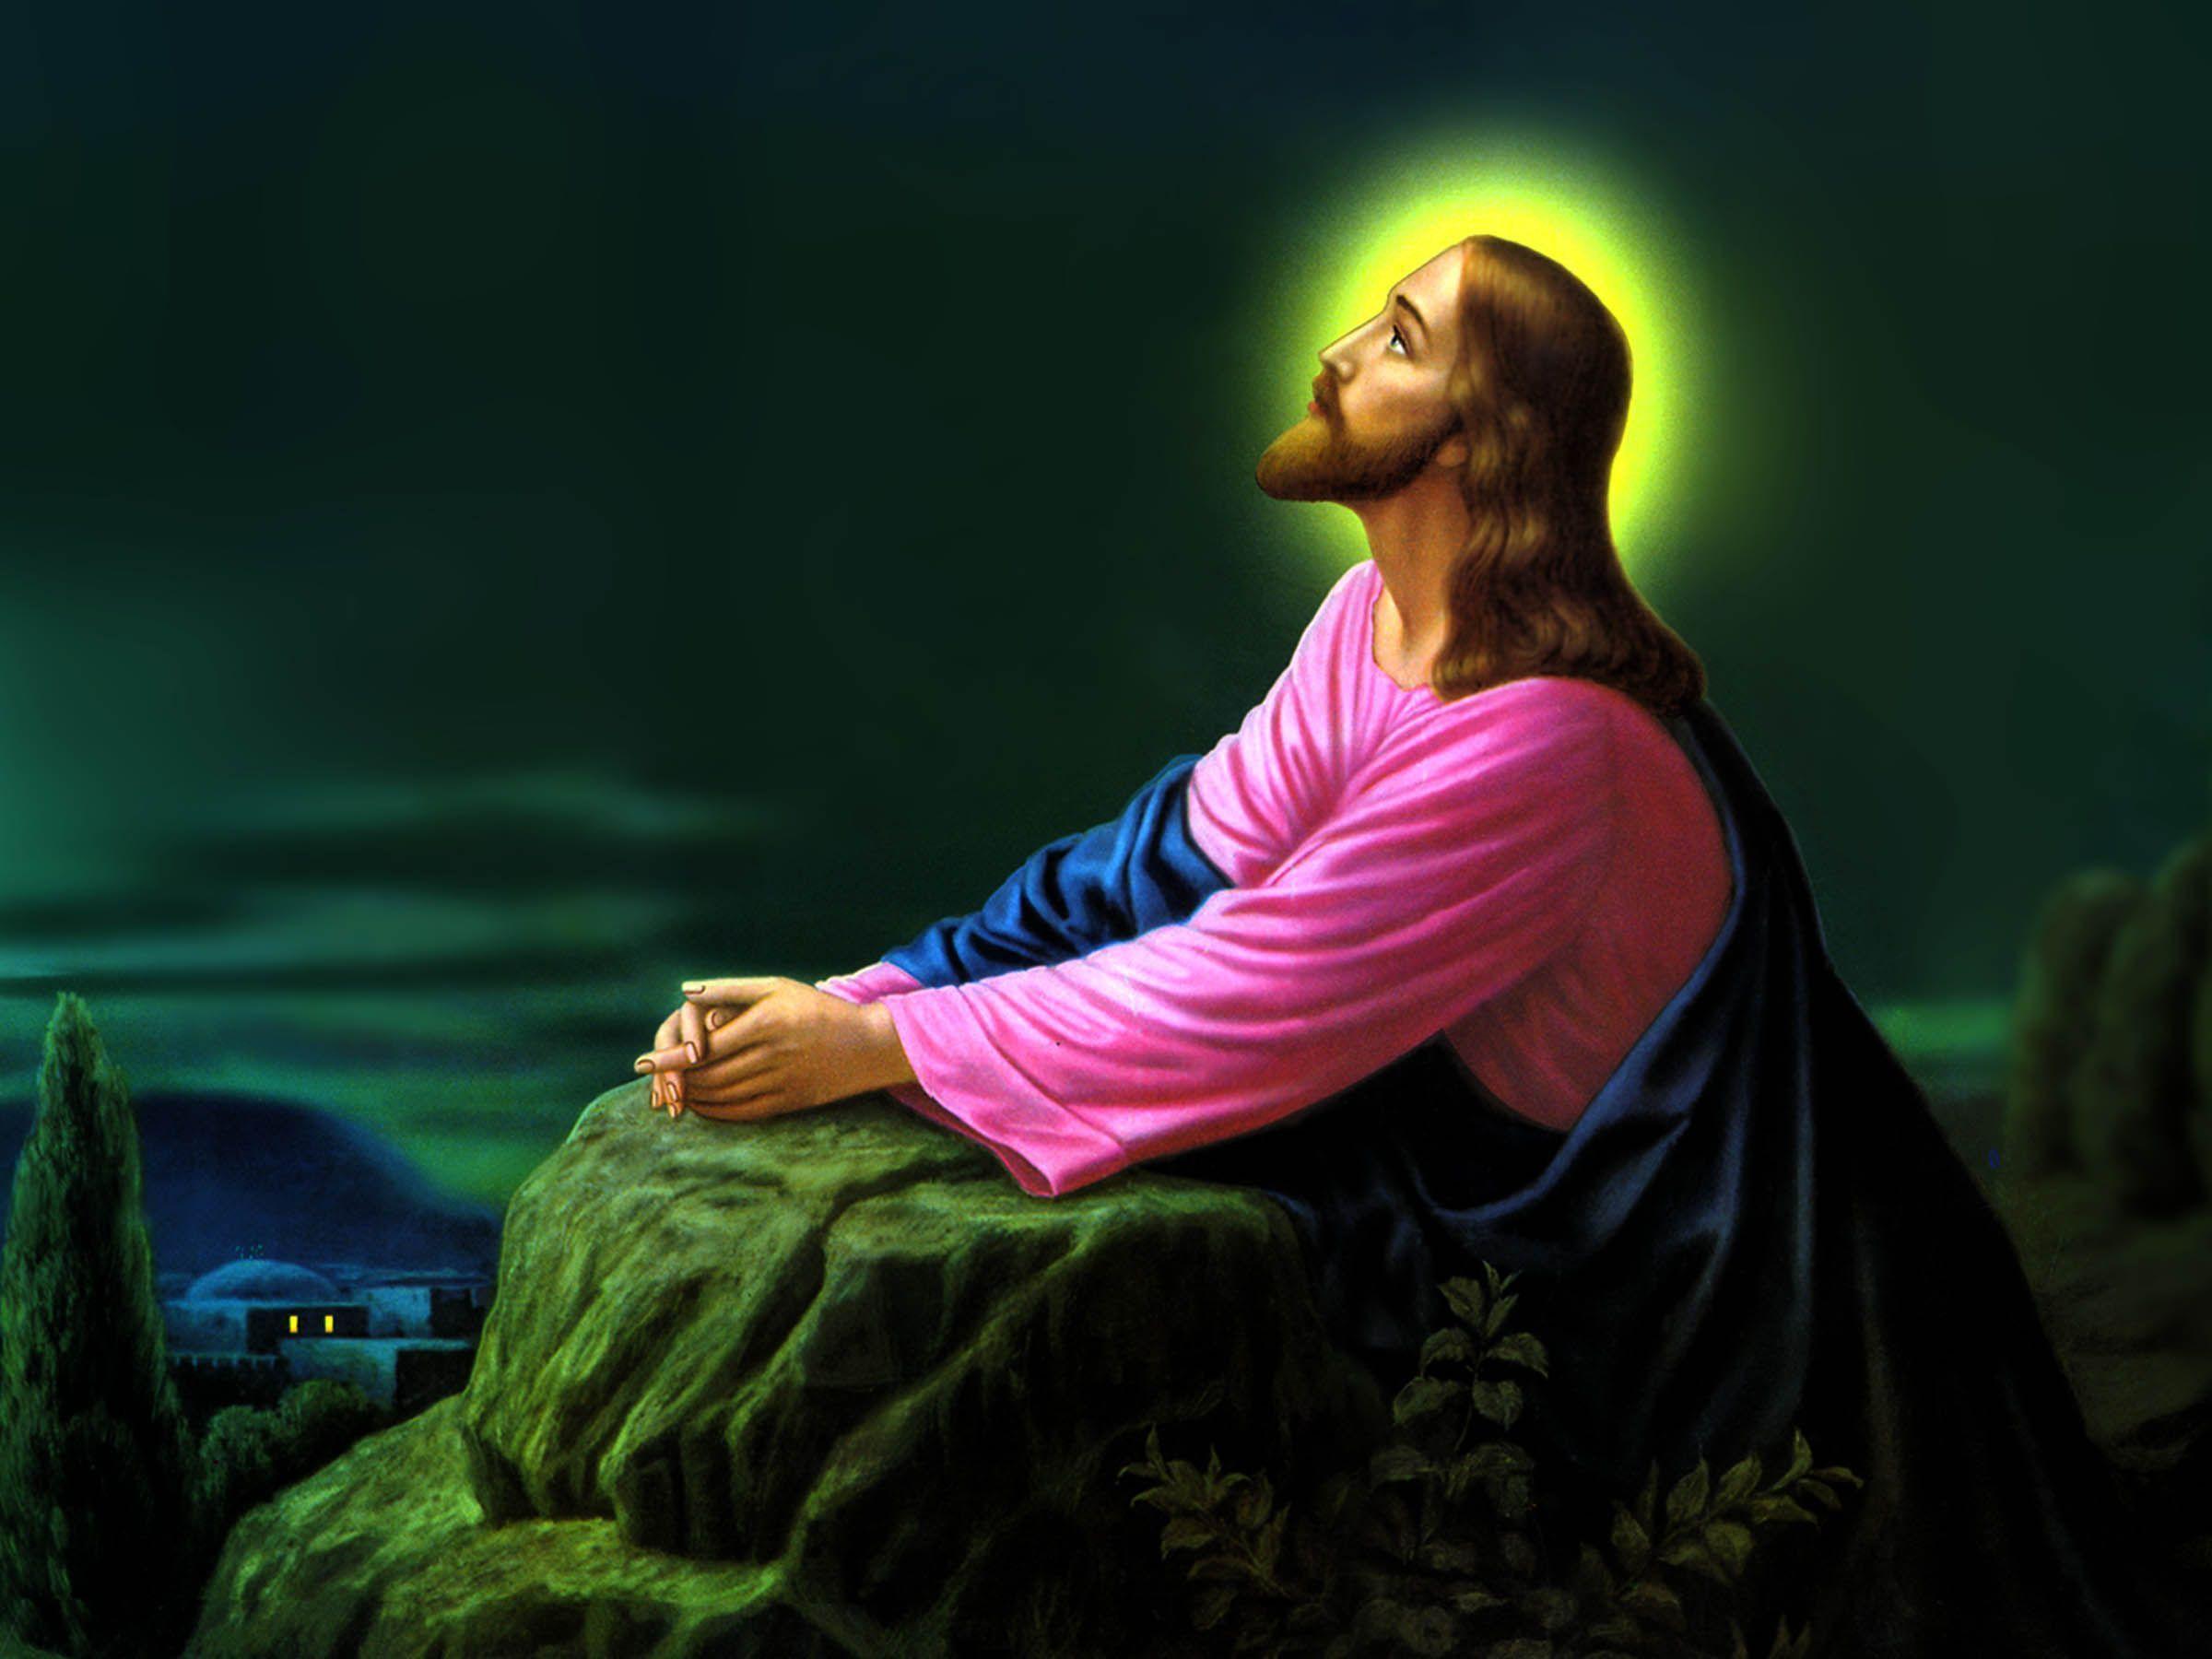 chua jesus 44